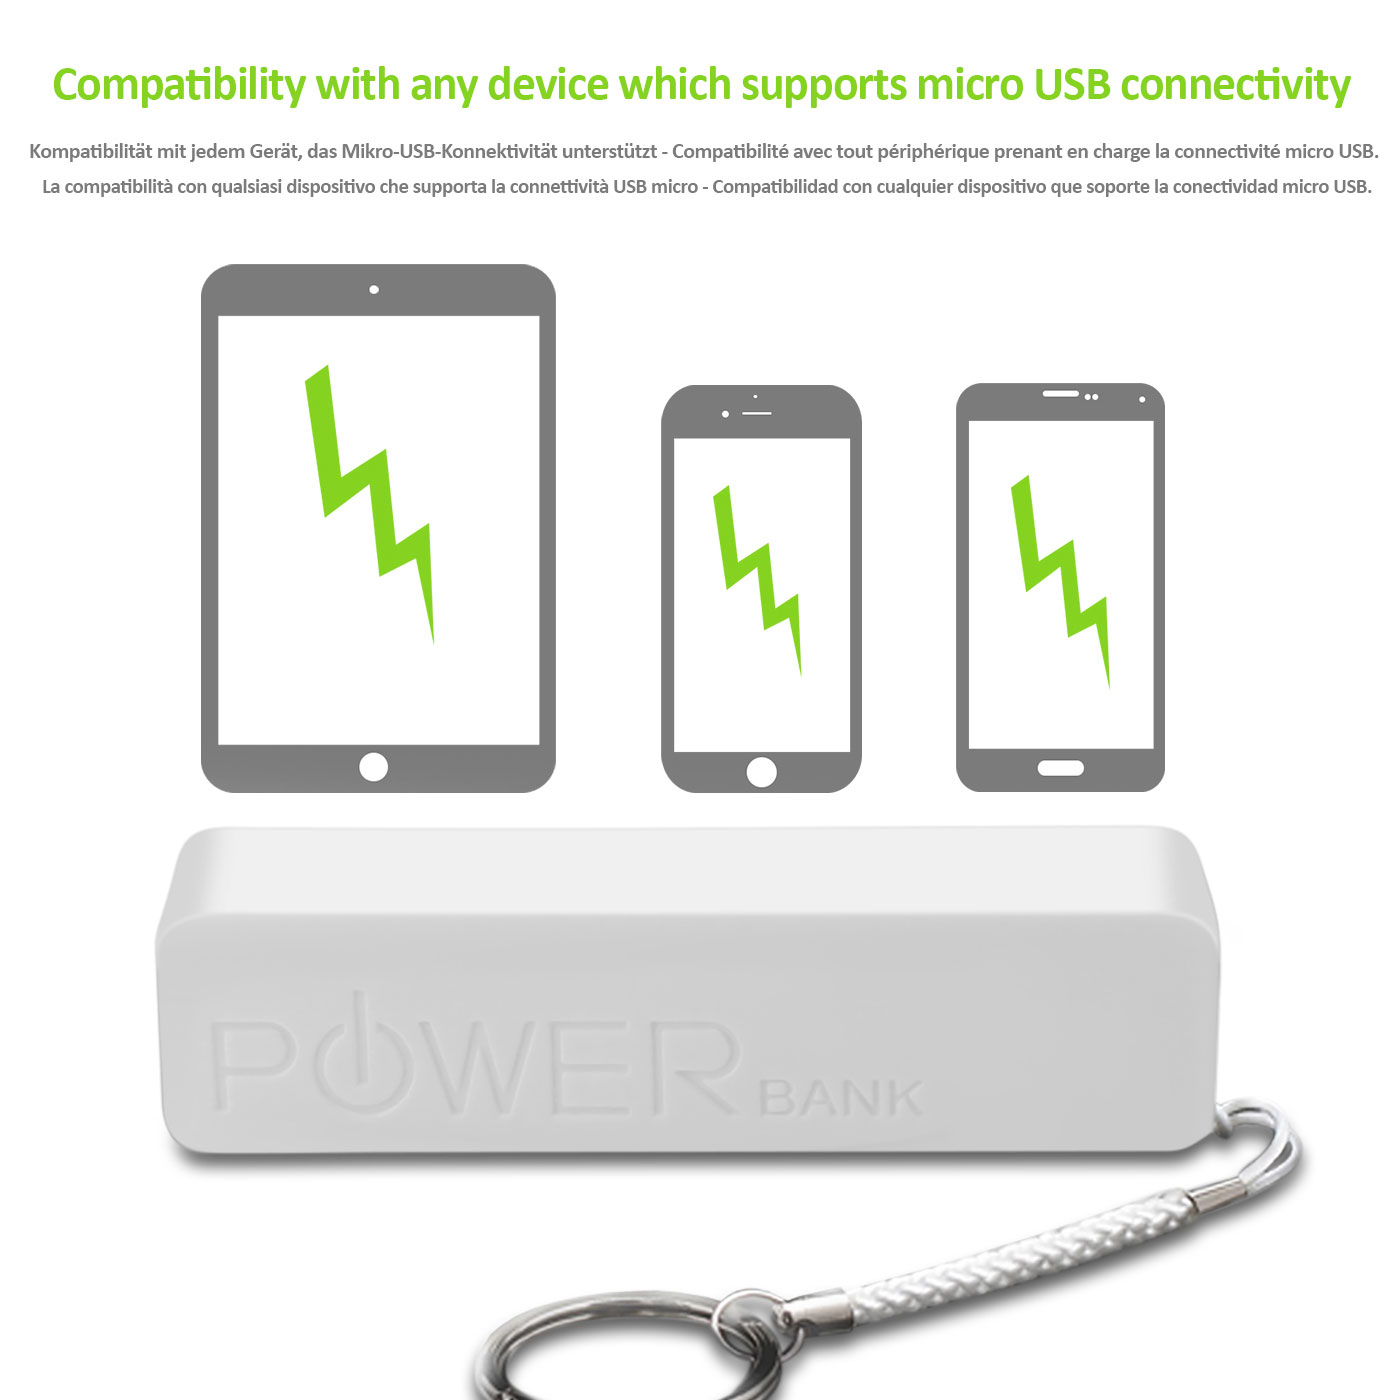 Power-Bank-Caricatore-Caricabatterie-Portatile-Portachiavi-Bianco-Per-Cellulare